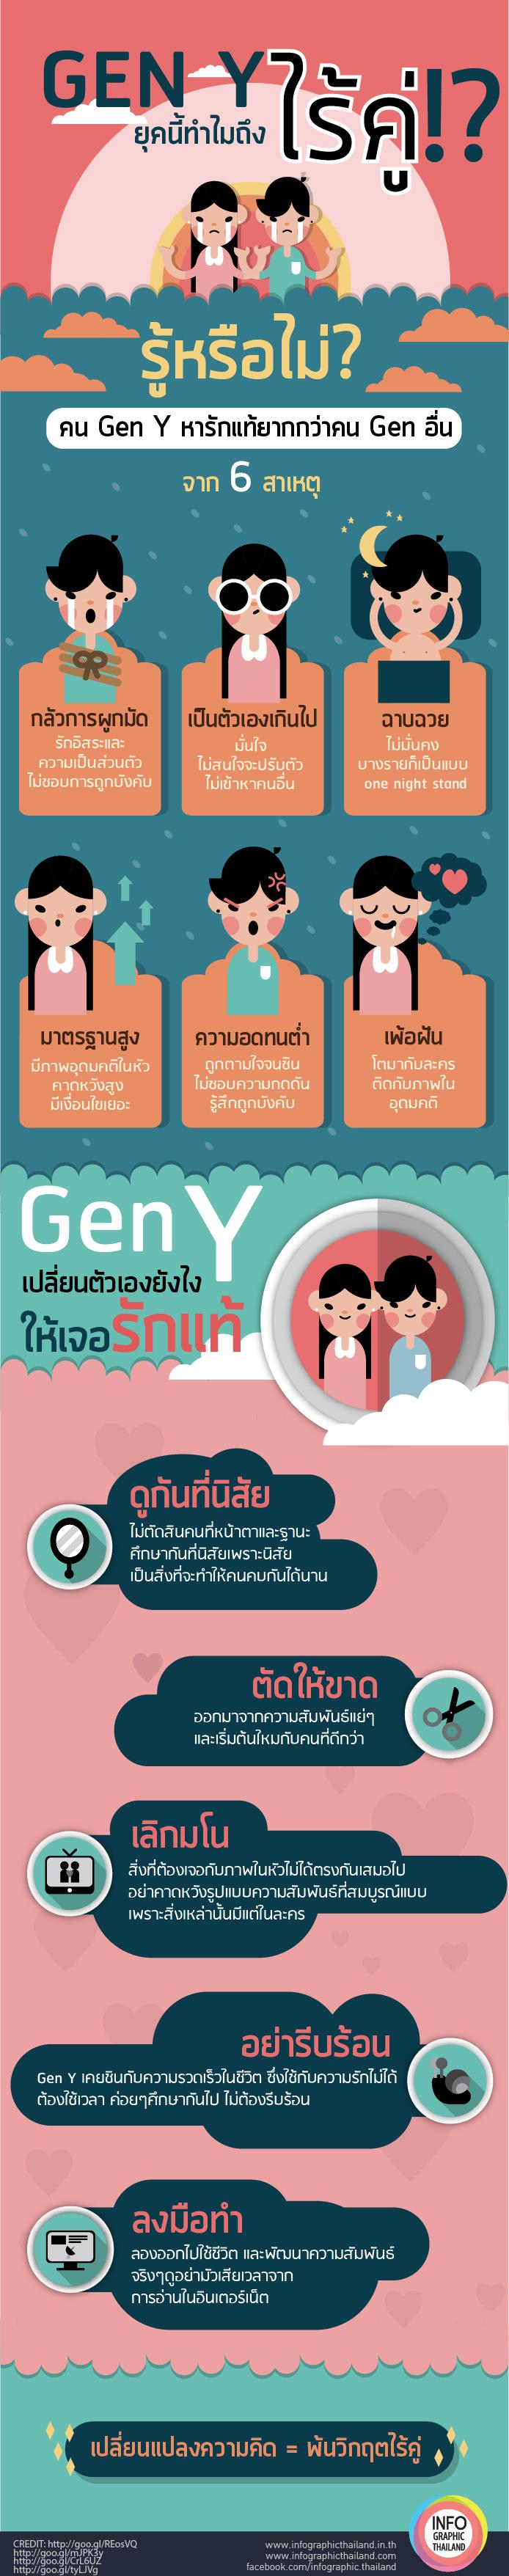 genYlove-01-01 (1)